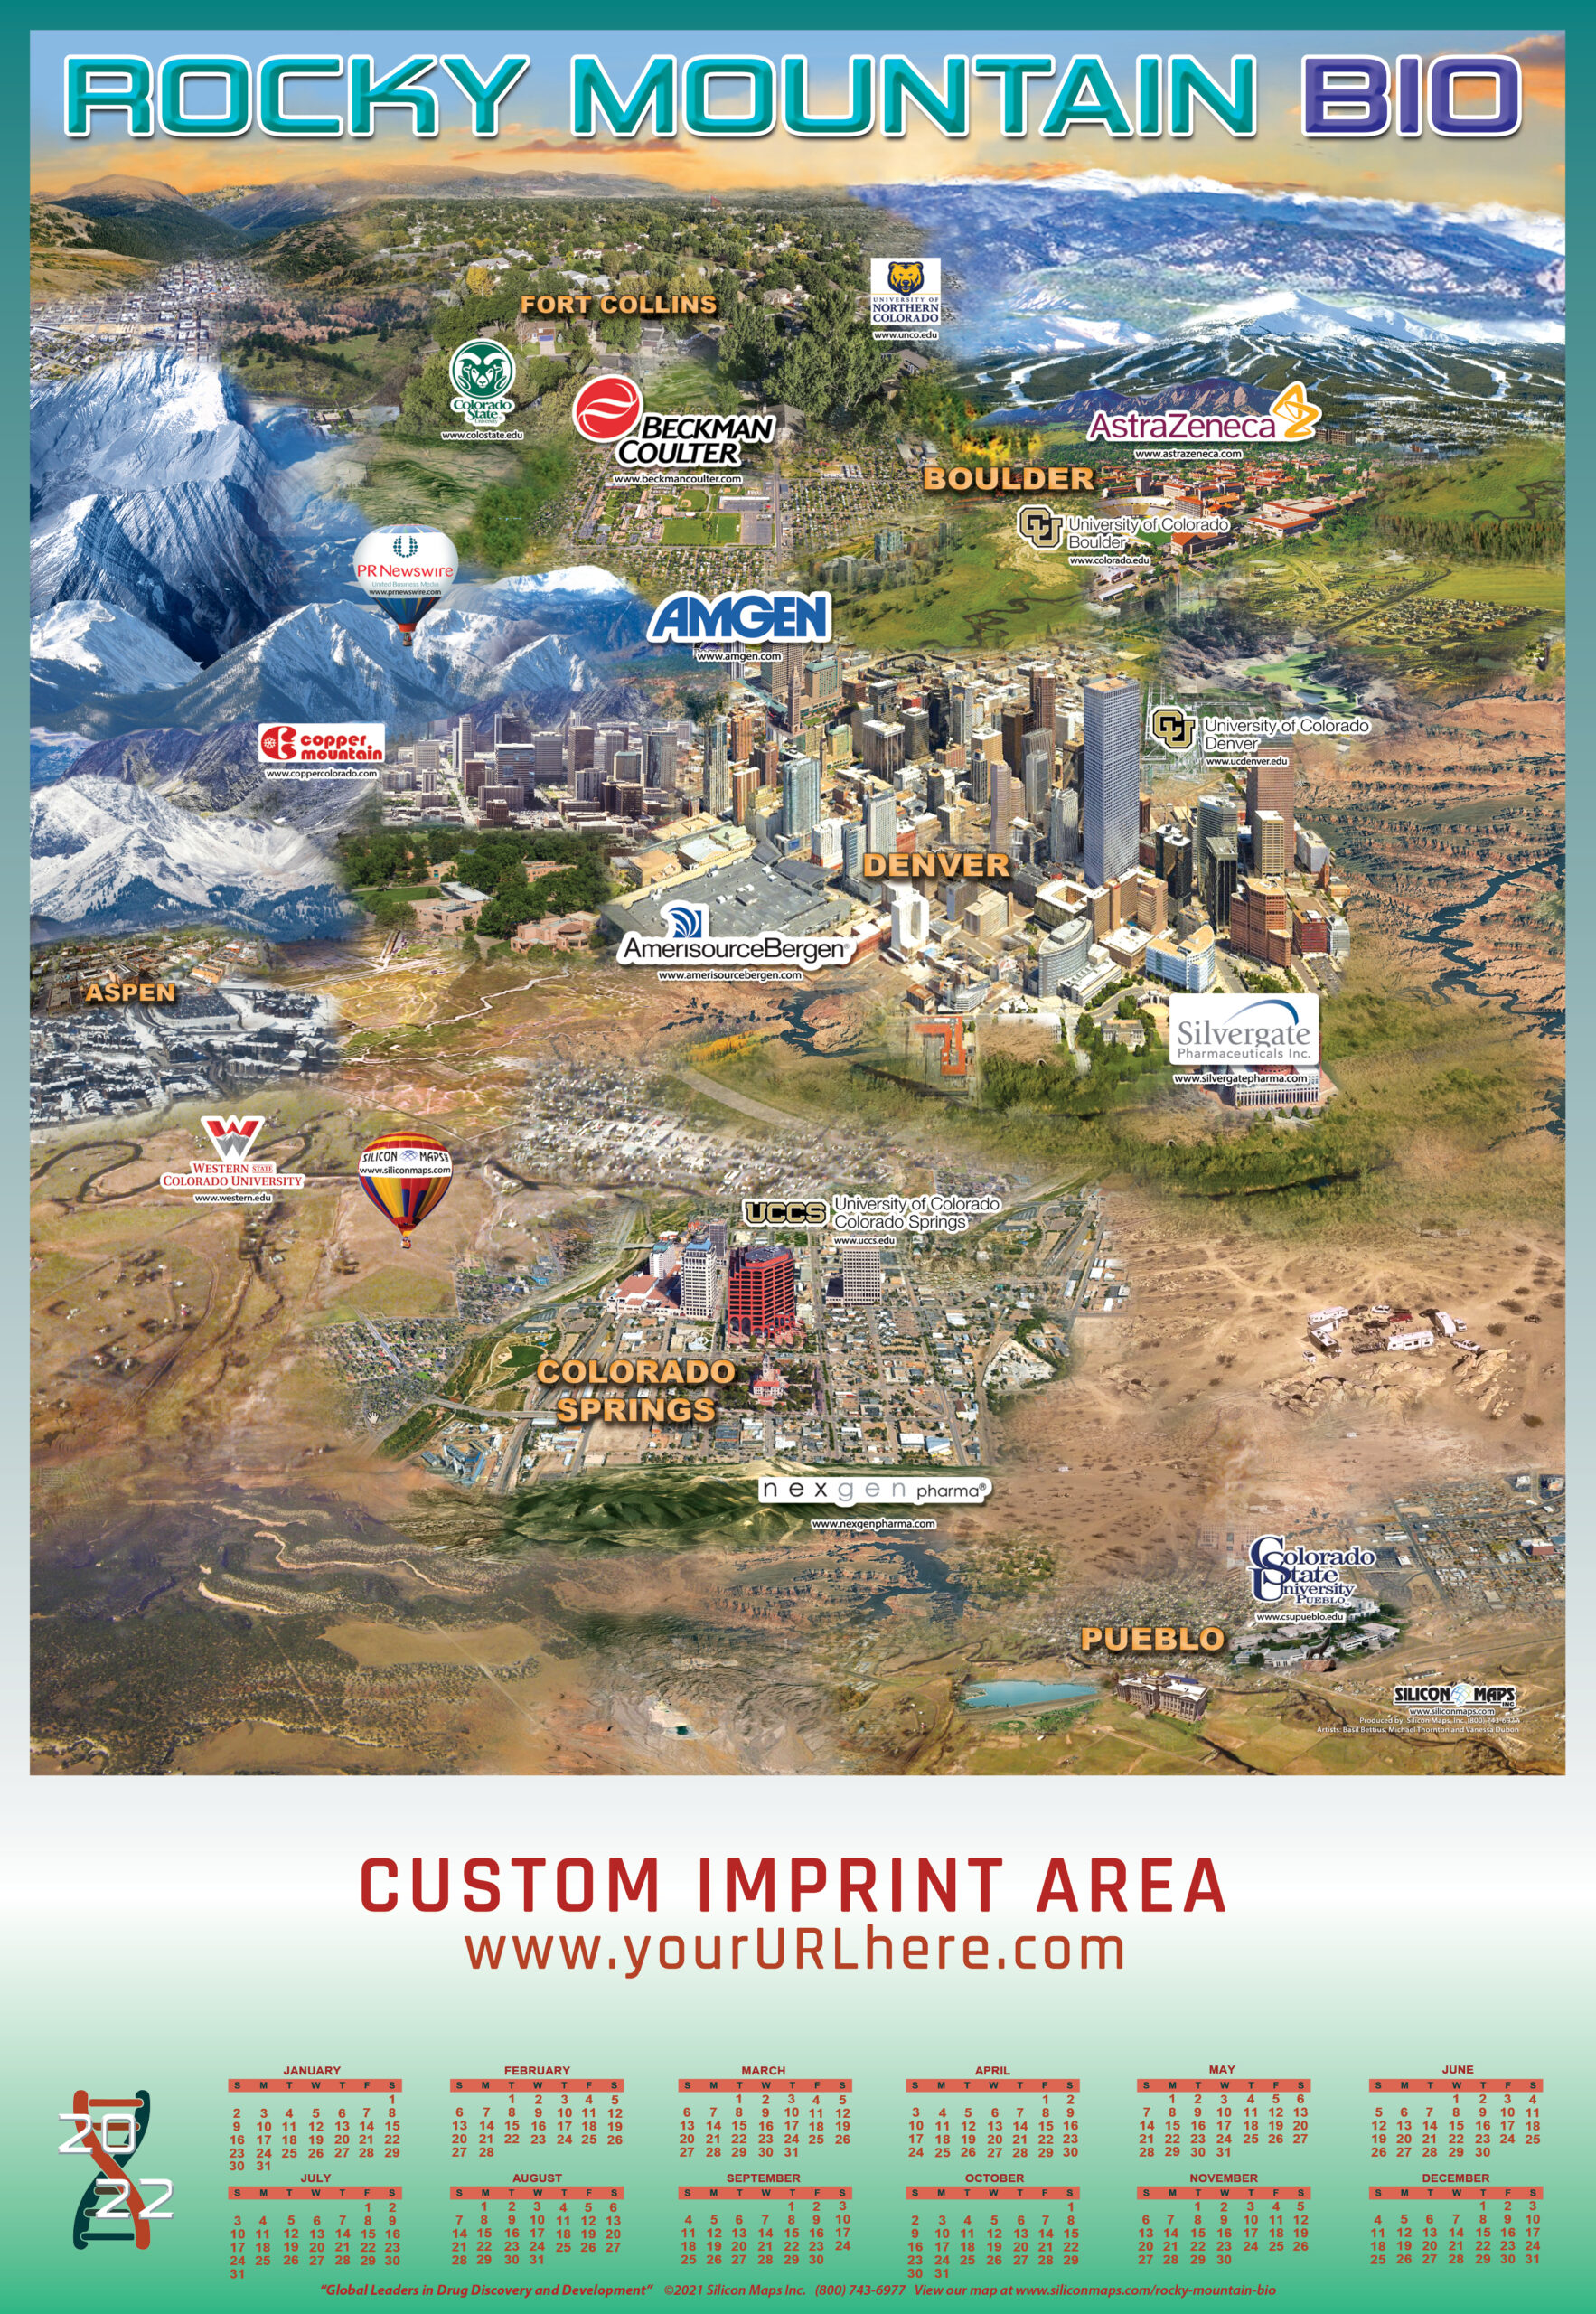 RMB22, Rocky Mountain BIO, Bio, Map, Business, Lab, hardware, Biology, companies